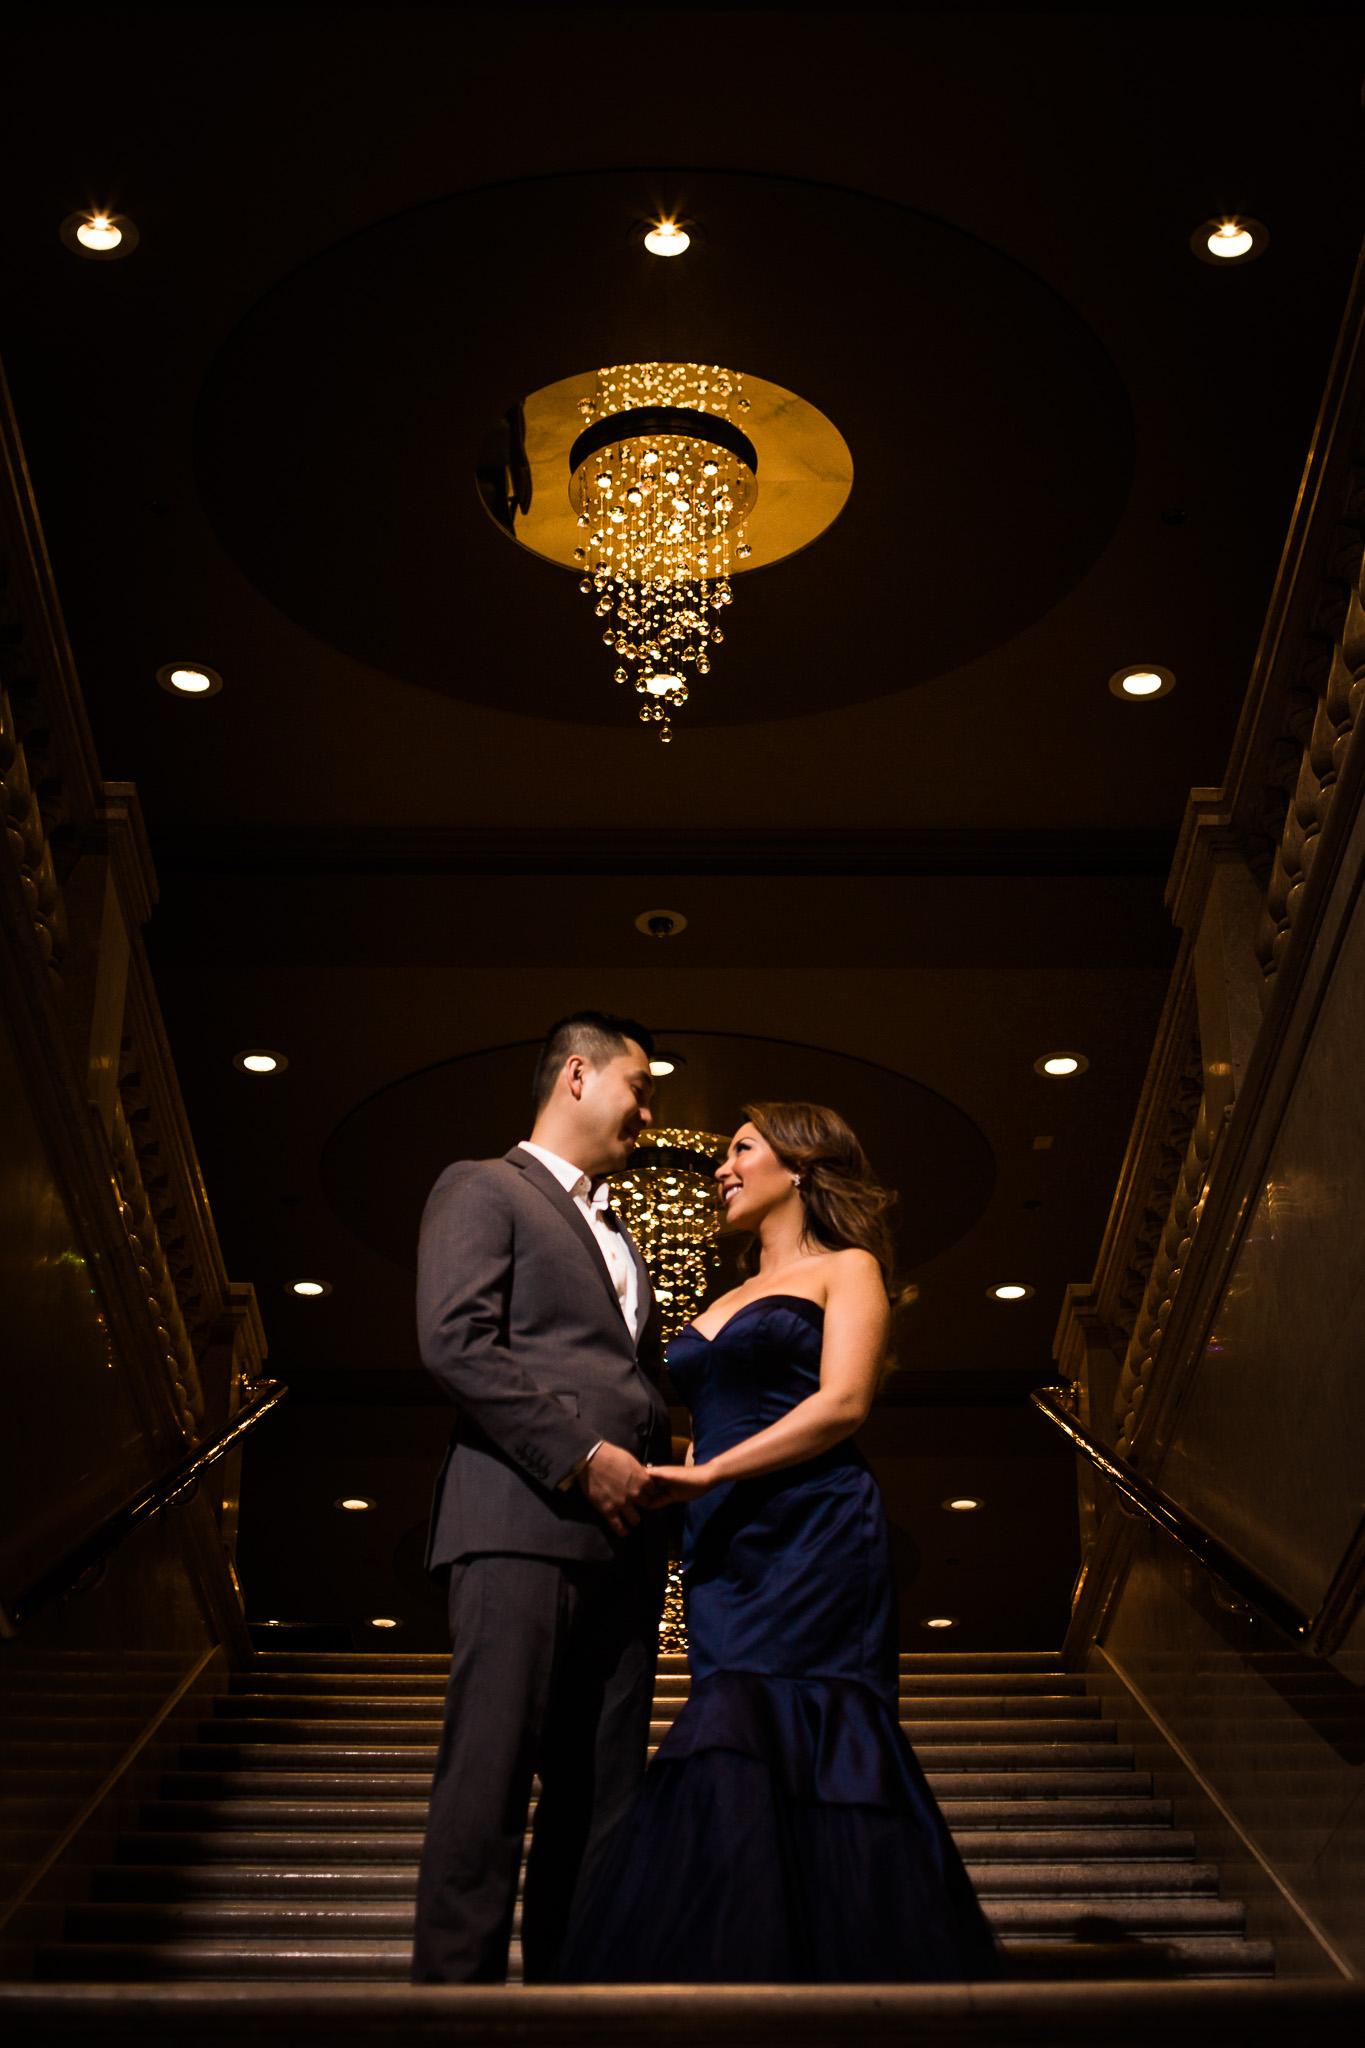 Torontoweddingphotographer-41.jpg